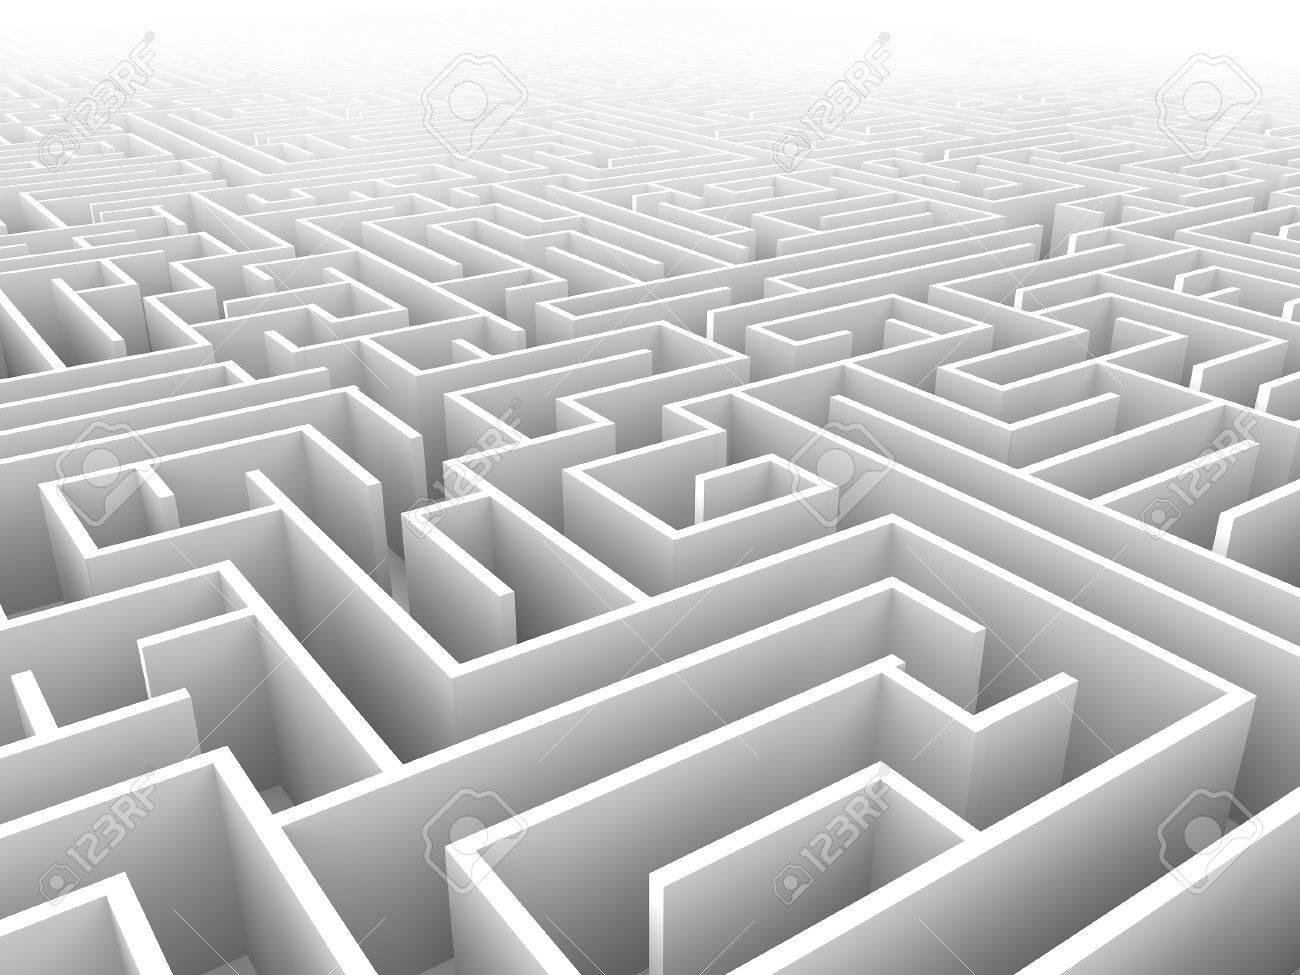 endless maze 3d illustration - 43119138